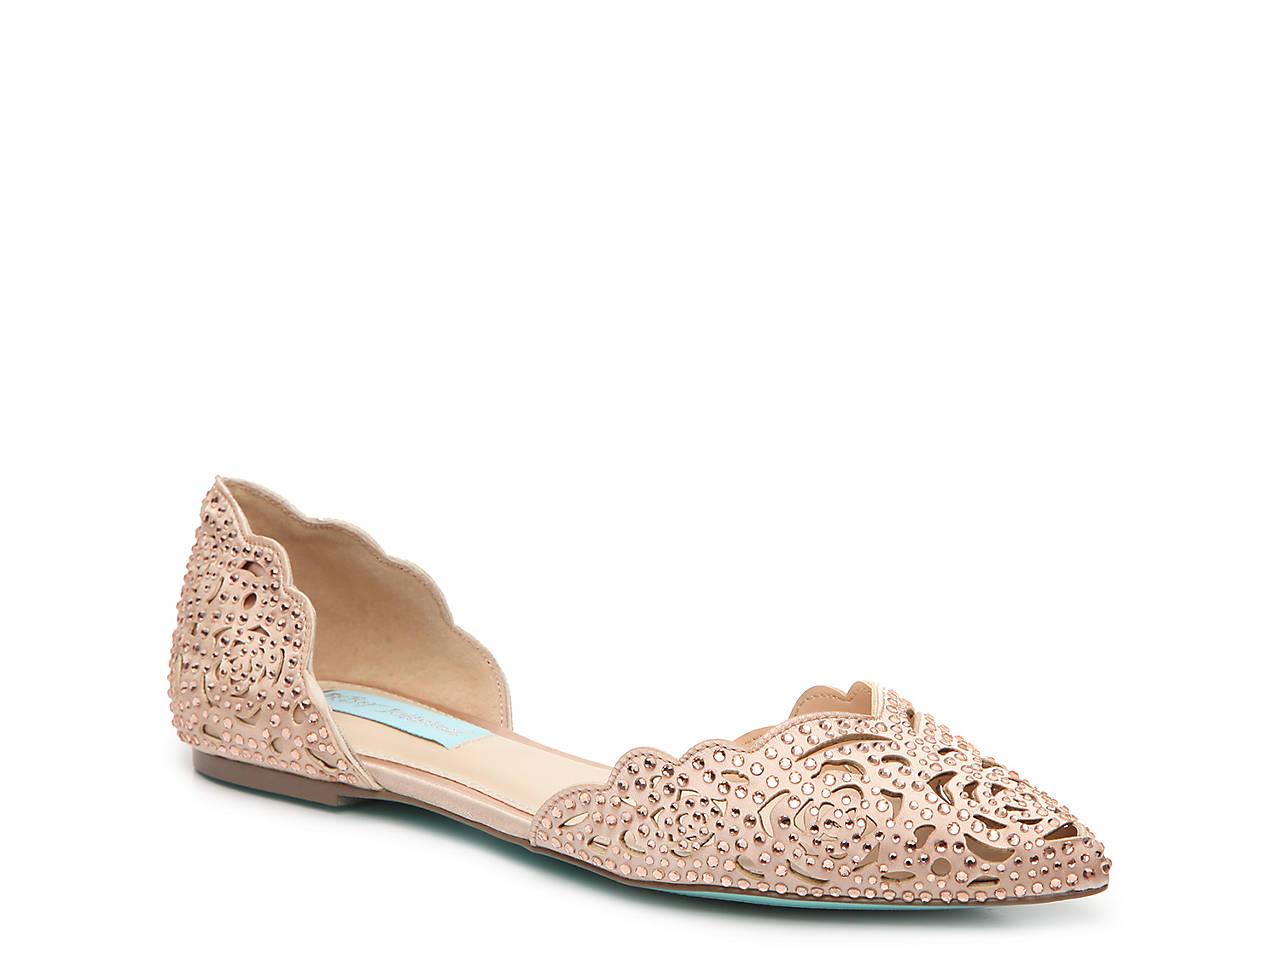 859b6d3cb20 Betsey Johnson Miley Flat Women s Shoes